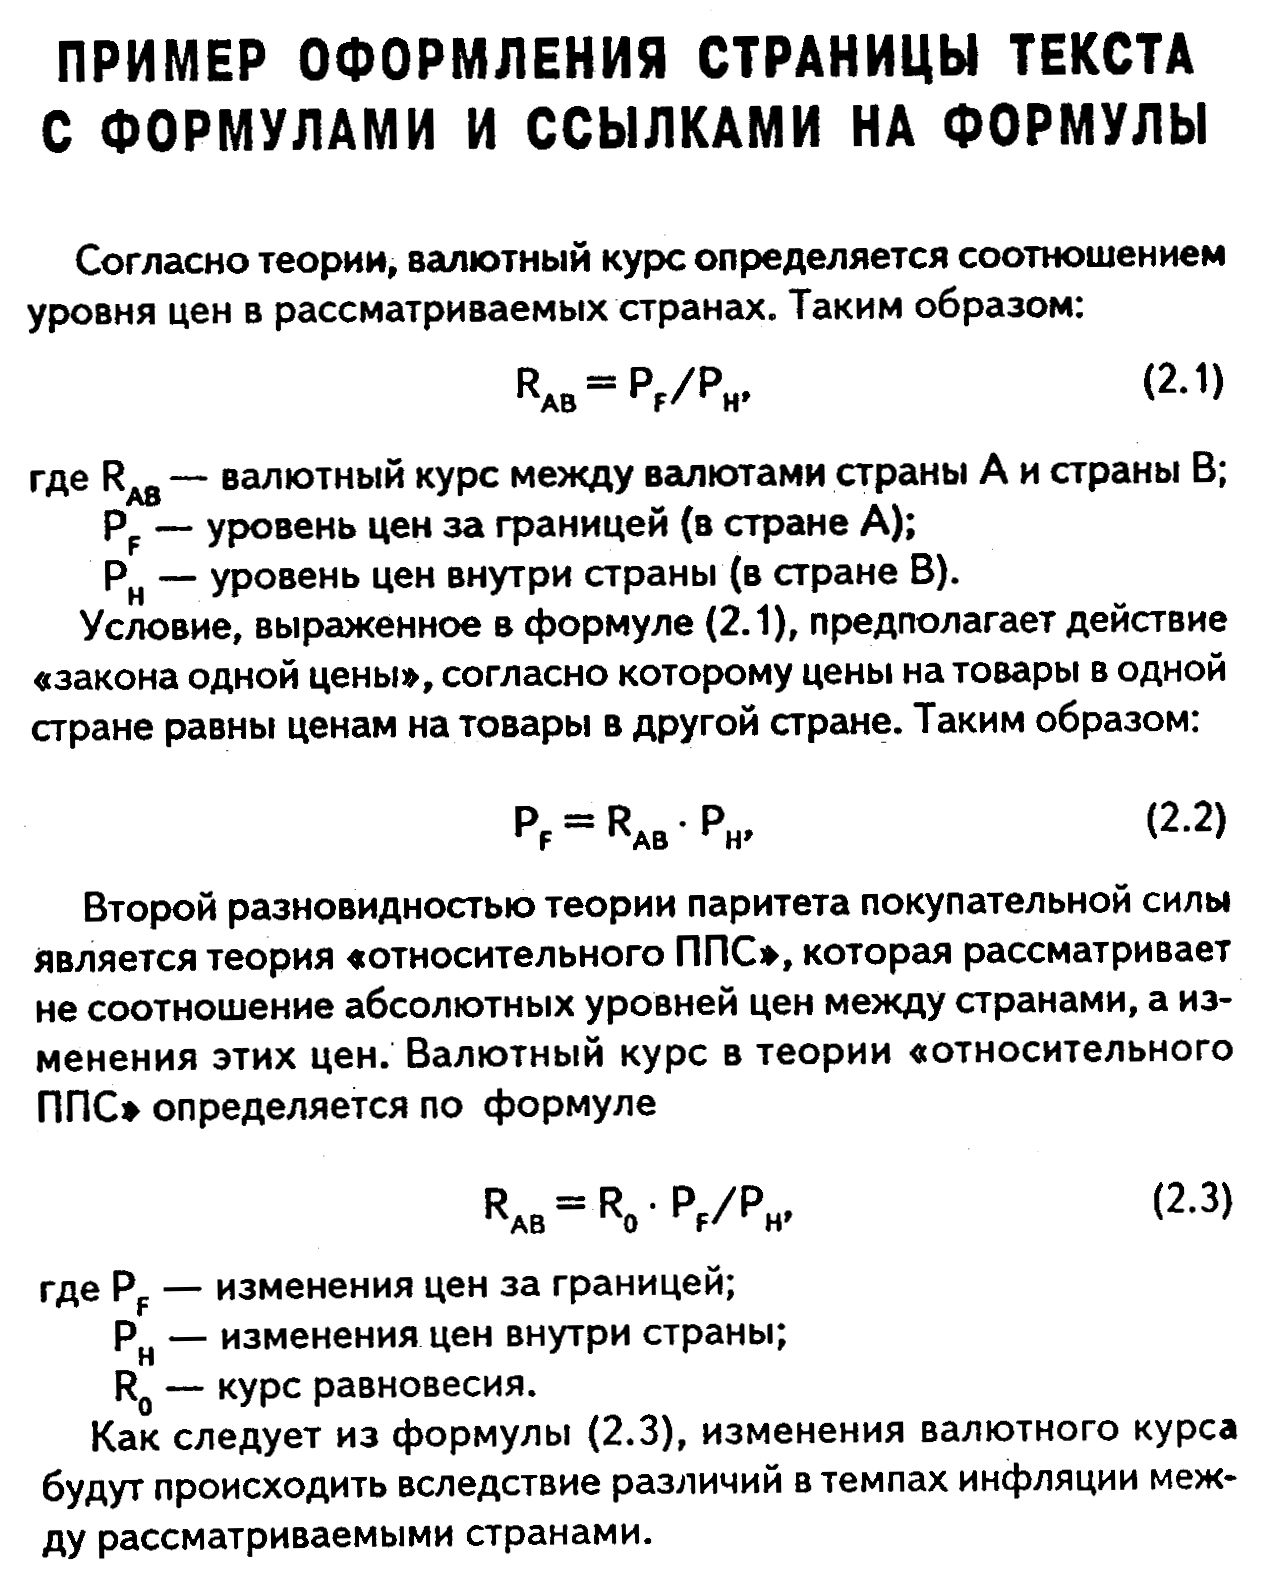 Обозначение формул в дипломе Автор gyh fghfg Обозначение ссылок на формулы в дипломной работе